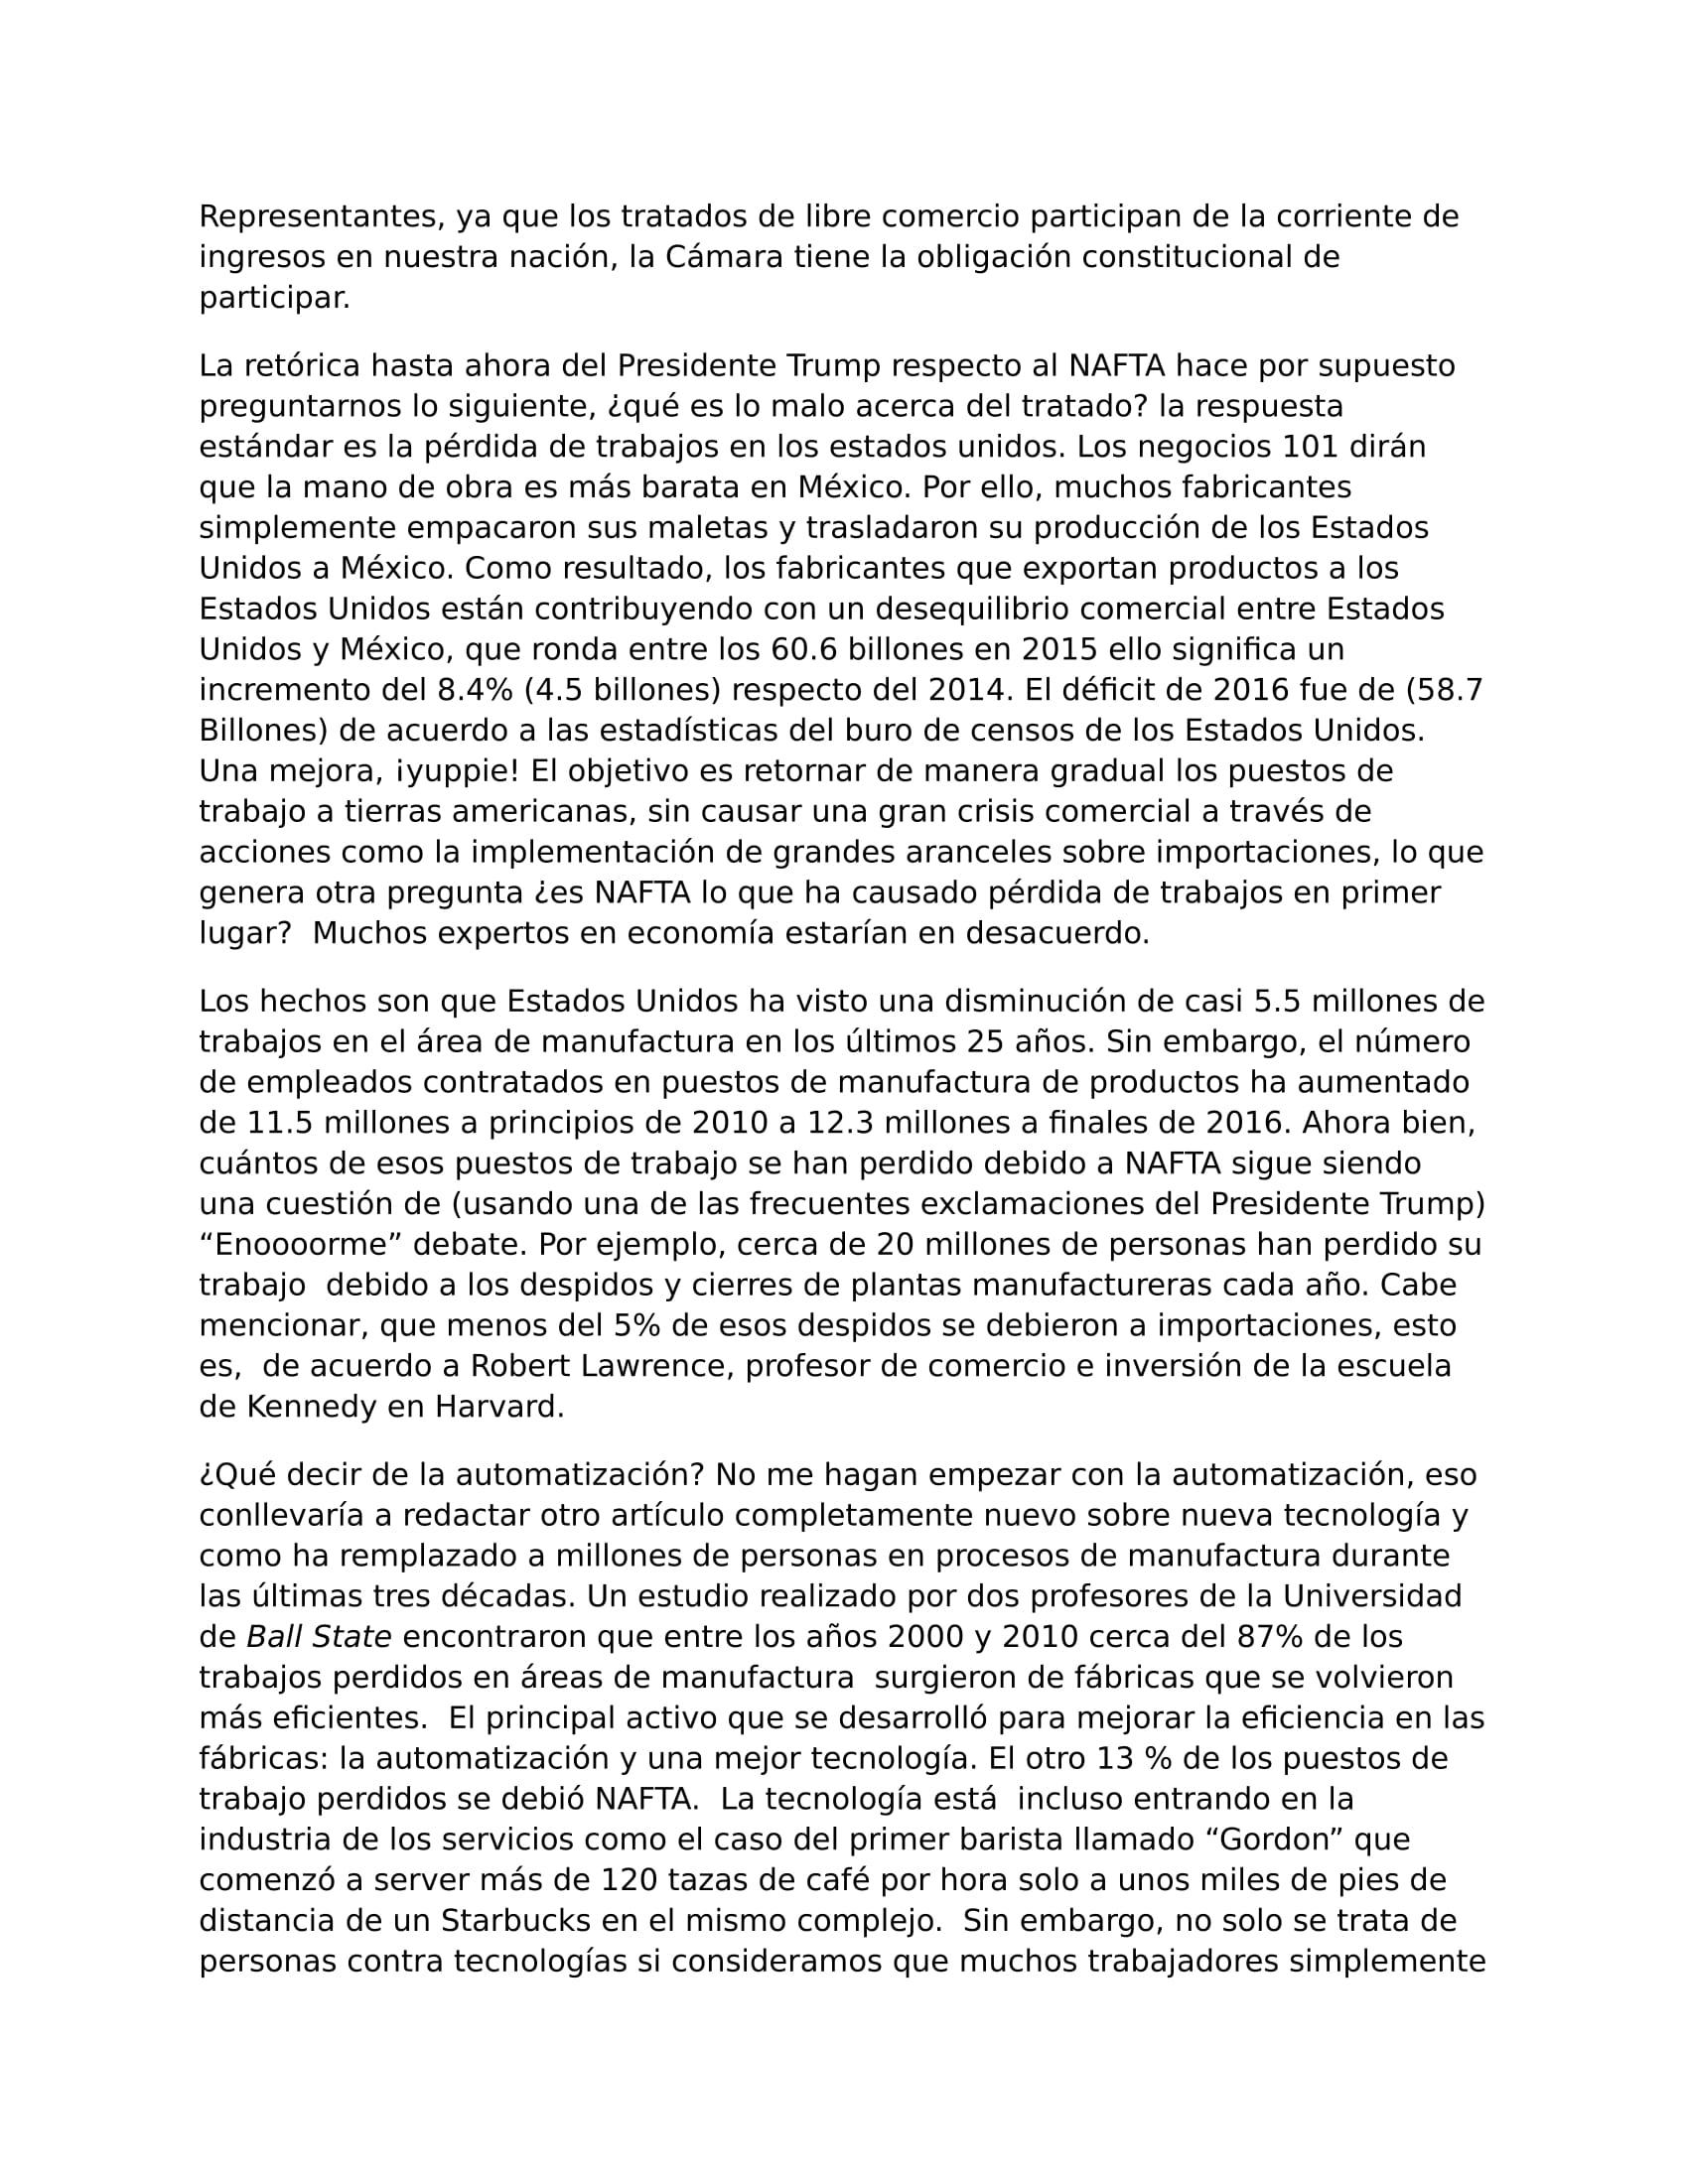 A renegocitation of NAFTA... Spanish Translation CHS-2